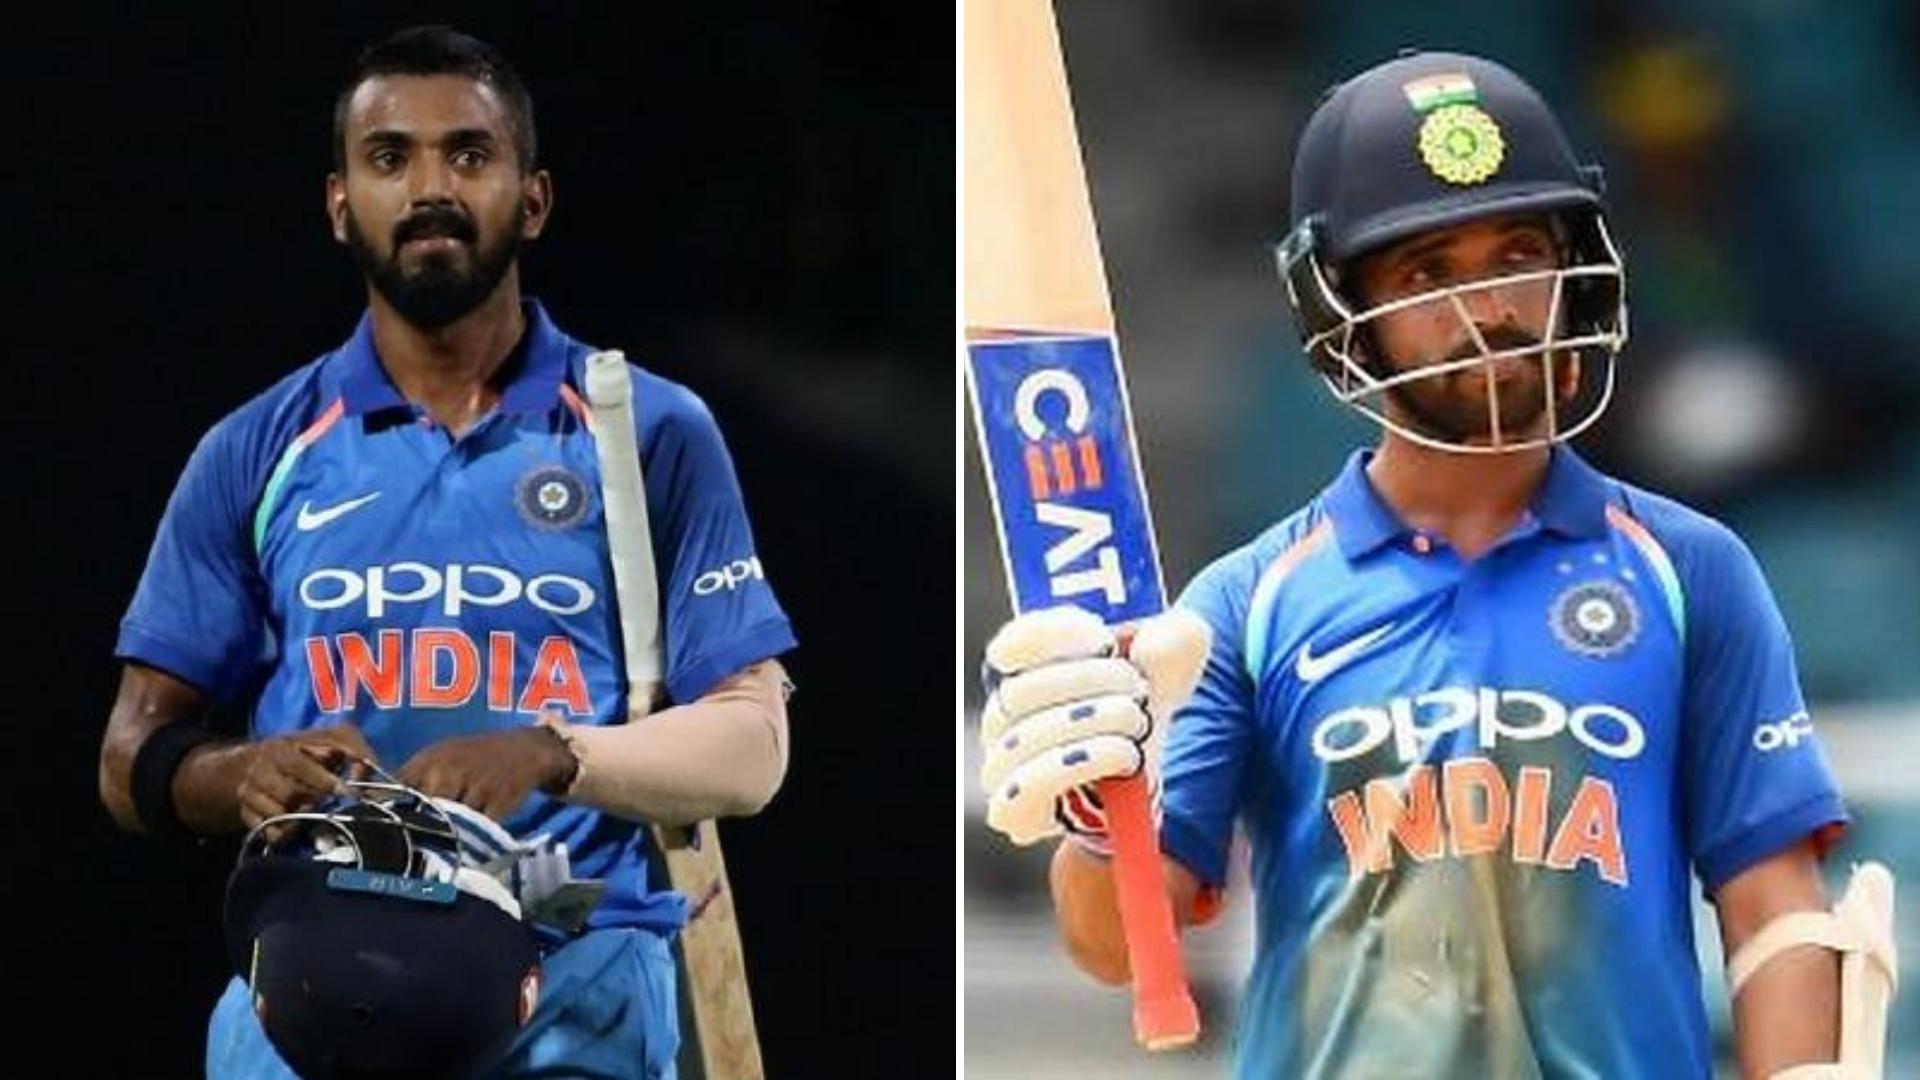 KL Rahul returns for Australia series; Karthik dropped